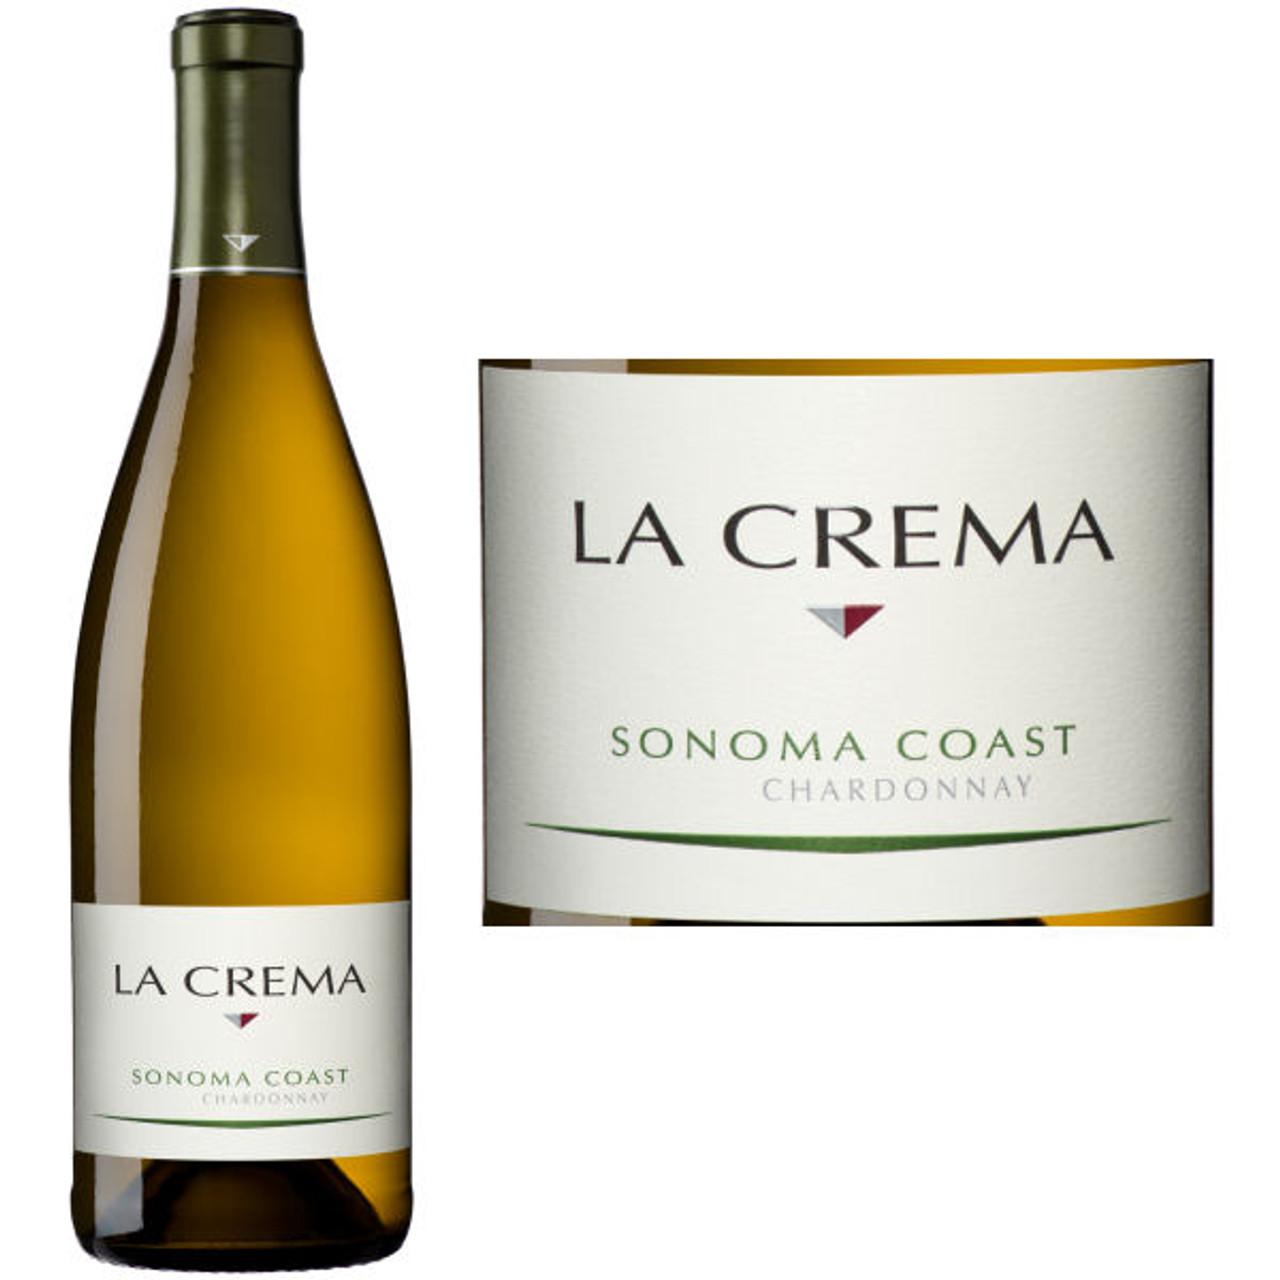 Super La Crema Sonoma Coast Chardonnay UY-67